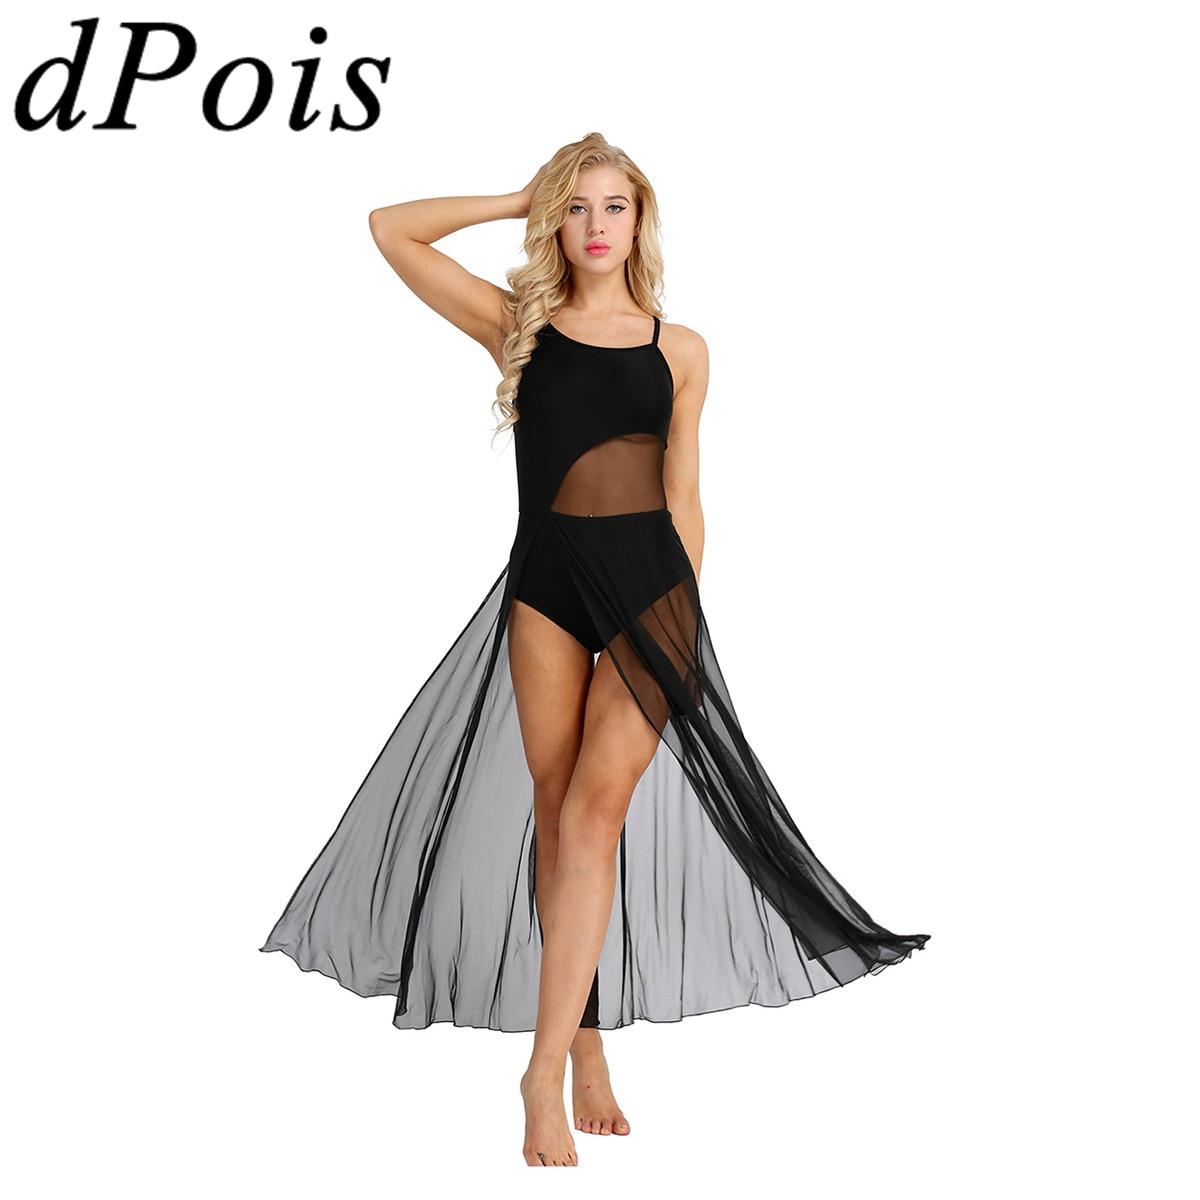 Mujeres de Ballet para adultos vestido de baile tutú bailarina modernos trajes de baile lírico asimétrico malla Maxi falda vestido construido en leotardo